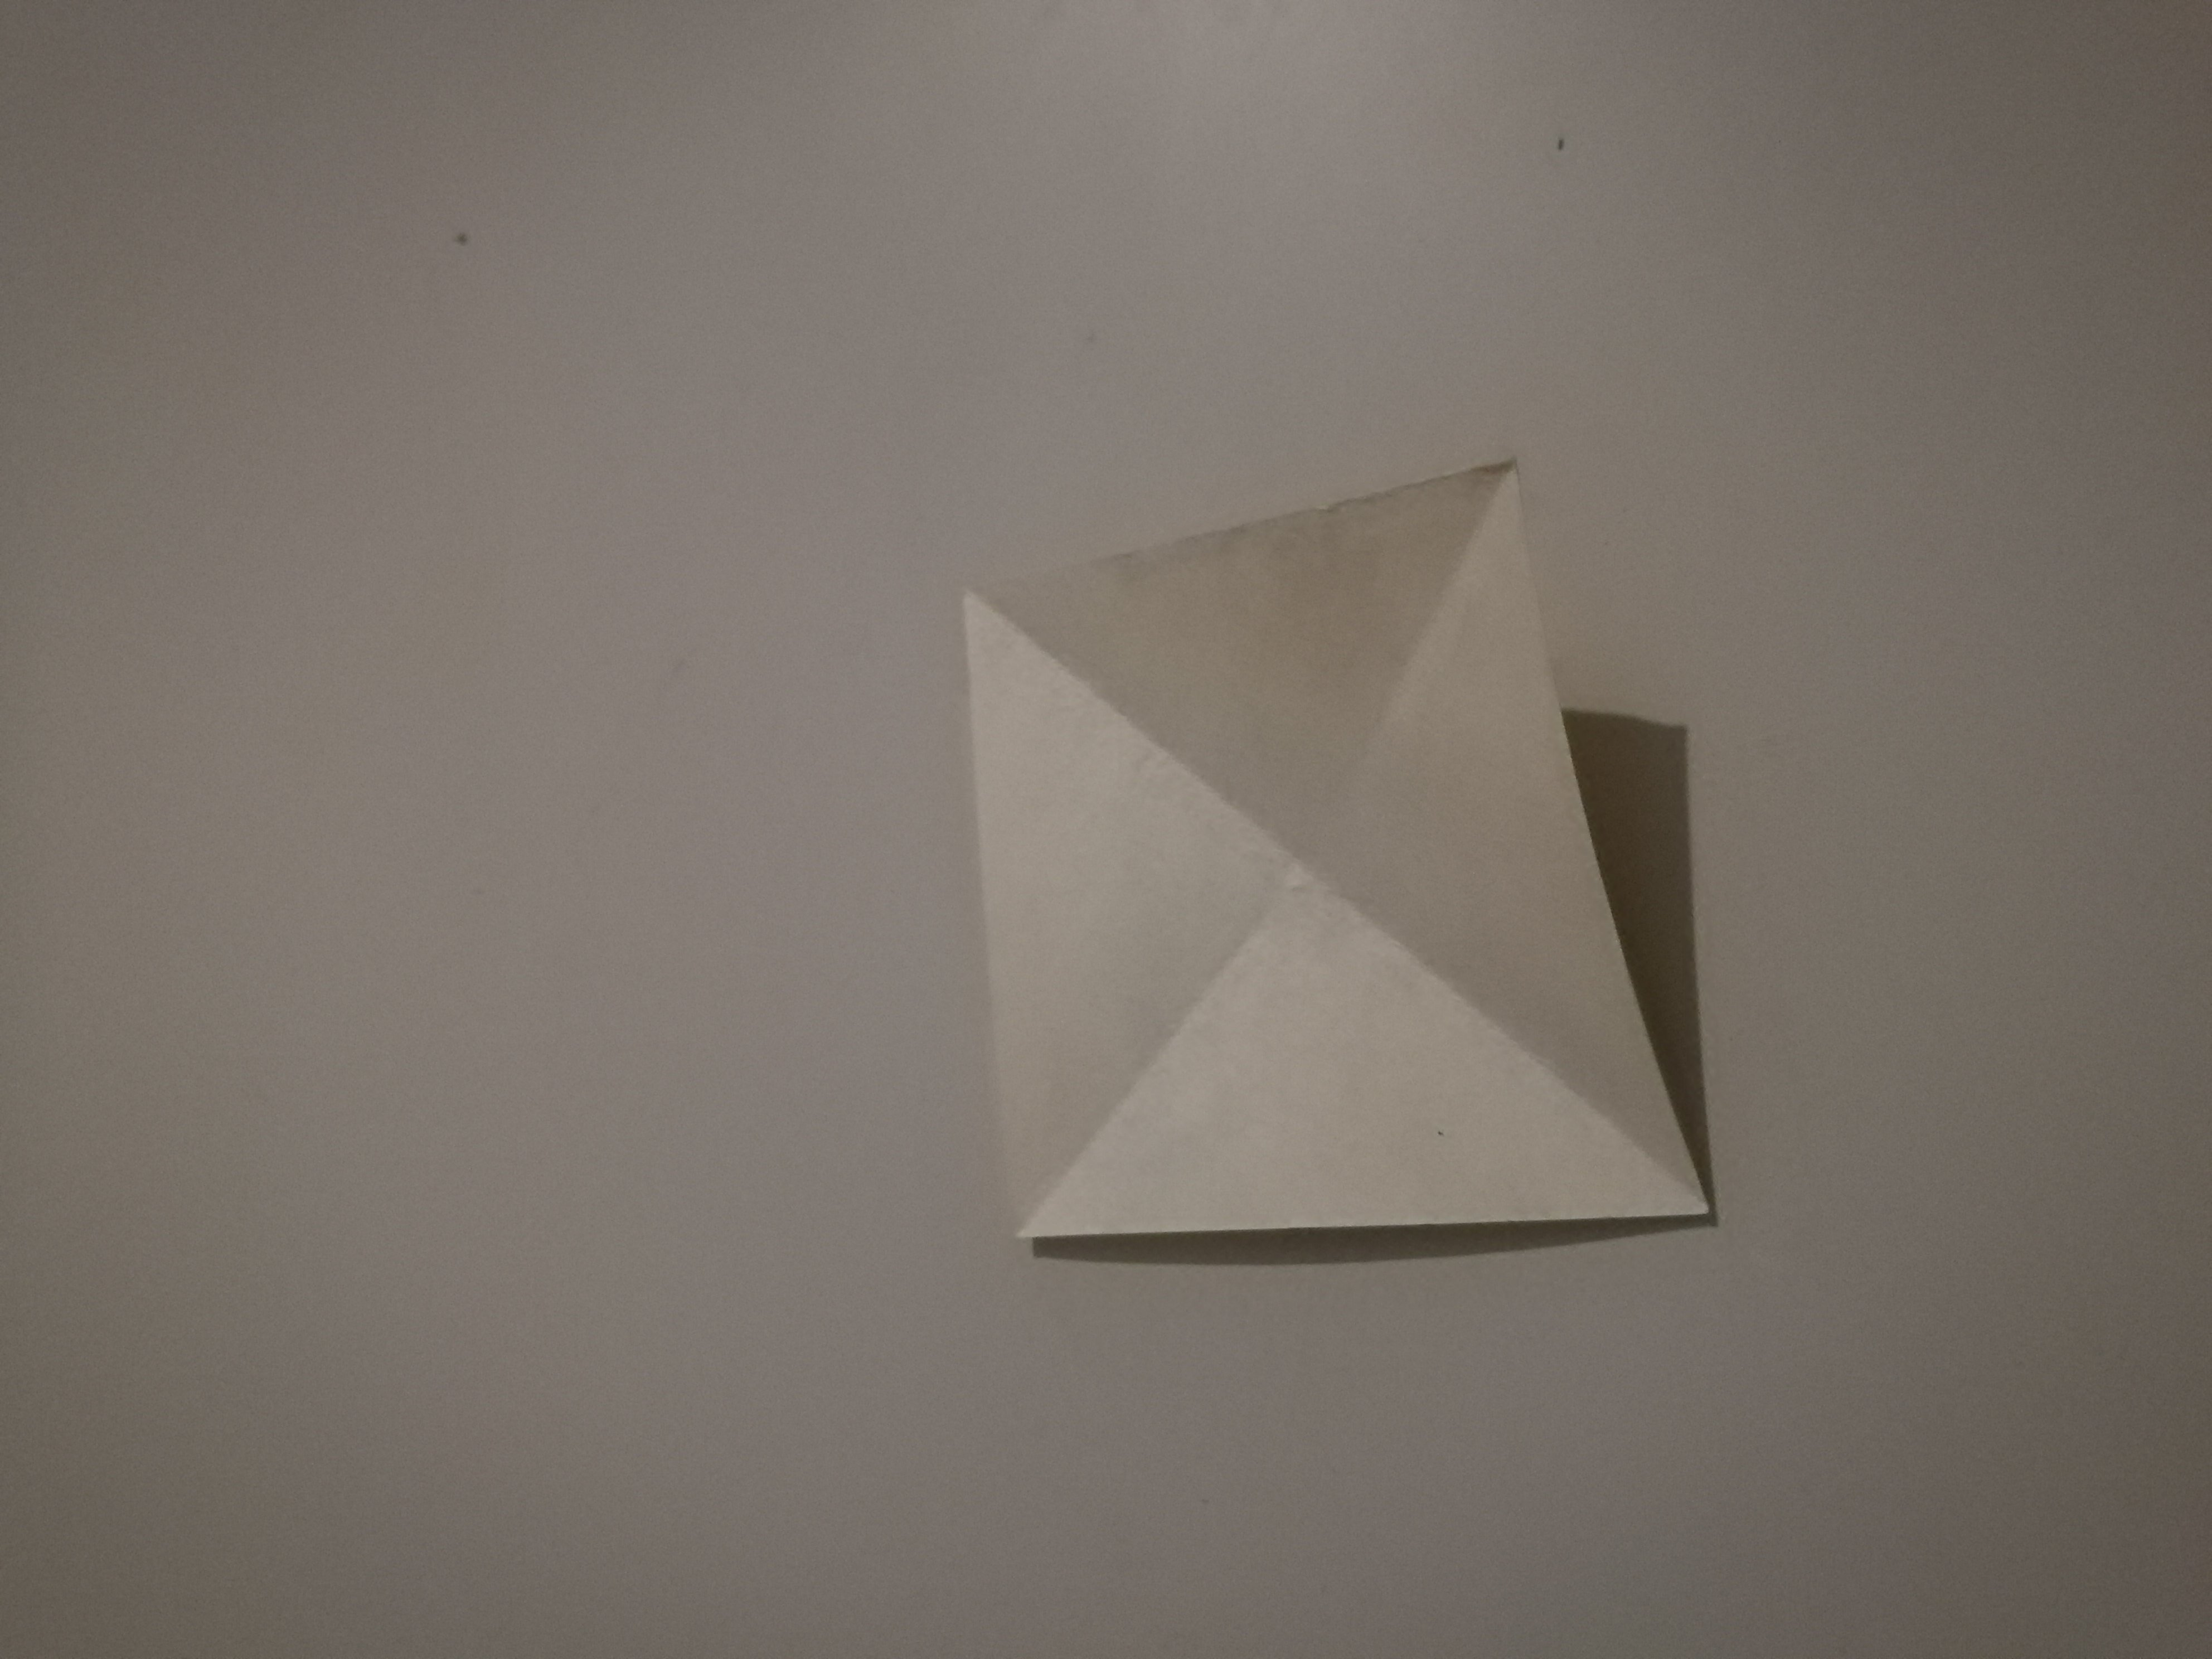 origami fleur lotus img with origami fleur lotus. Black Bedroom Furniture Sets. Home Design Ideas